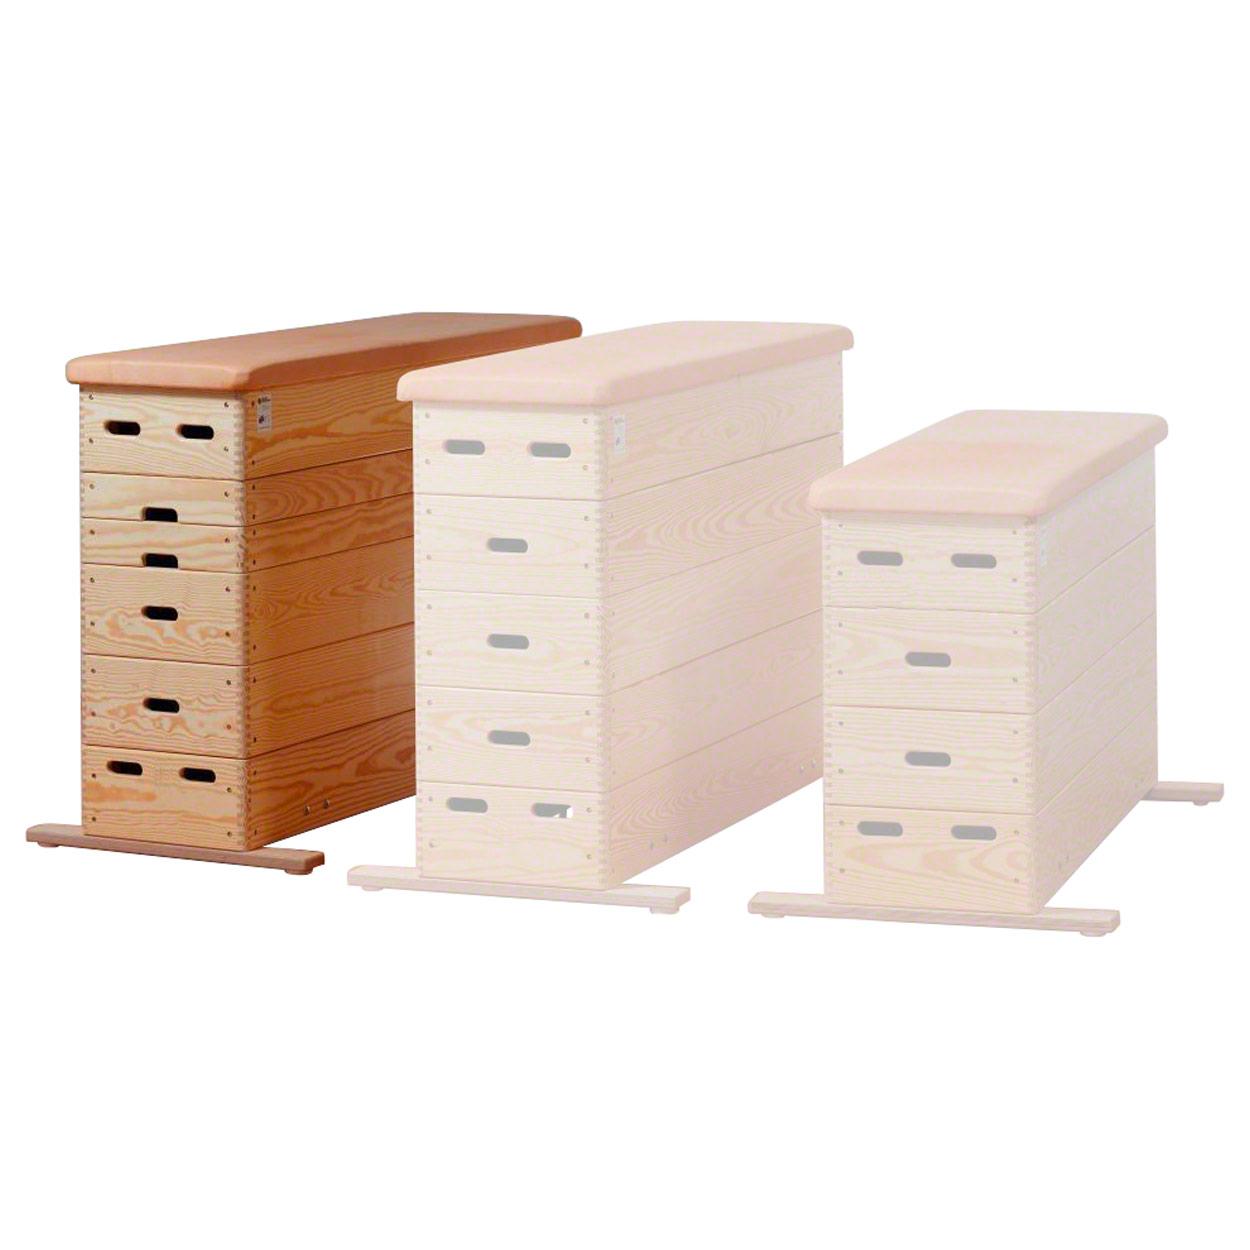 sprungkasten turnkasten sprungbock turnbock springbock springkasten ebay. Black Bedroom Furniture Sets. Home Design Ideas